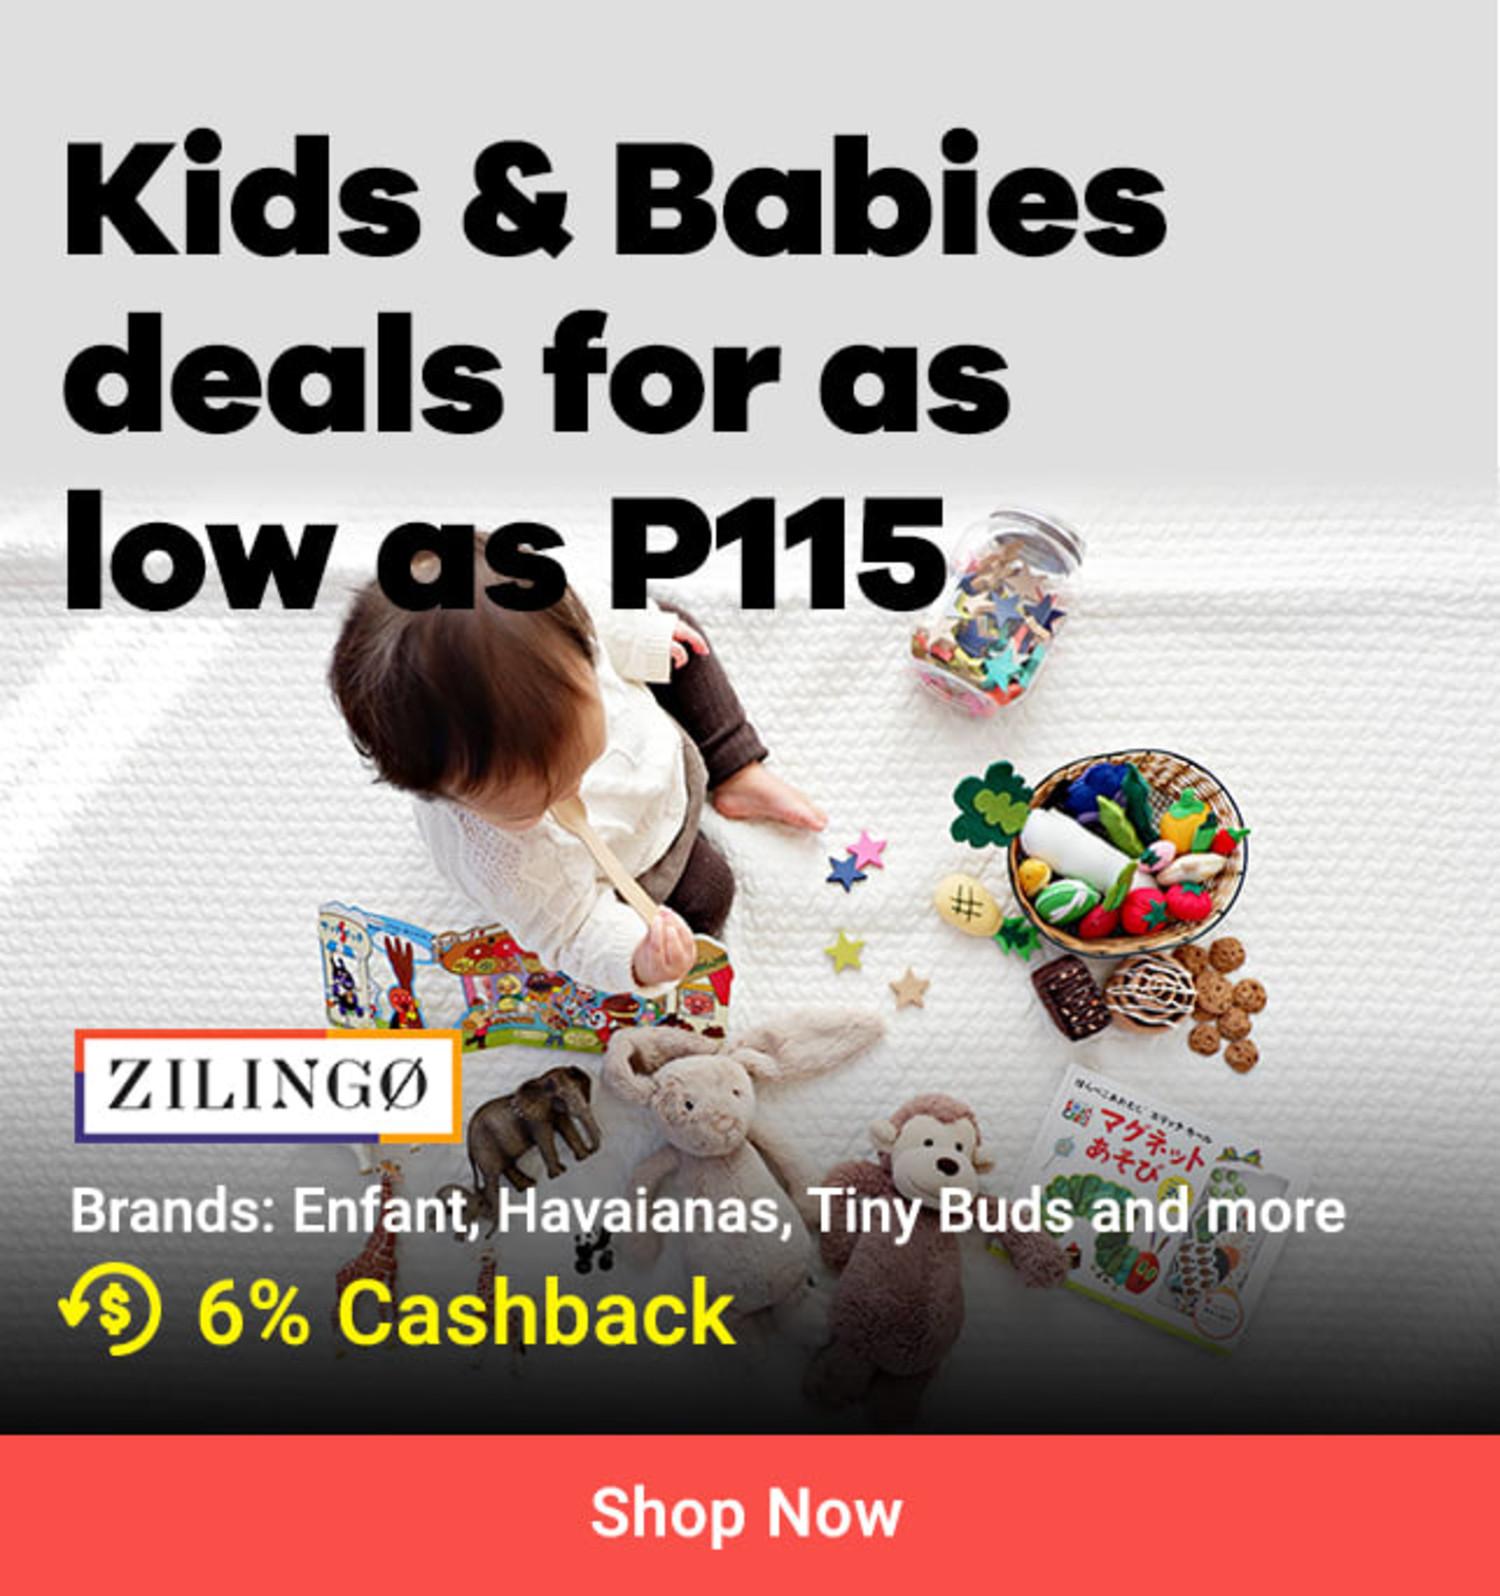 Zilingo Kids & Babies deals for as low as P115 6% Cashback